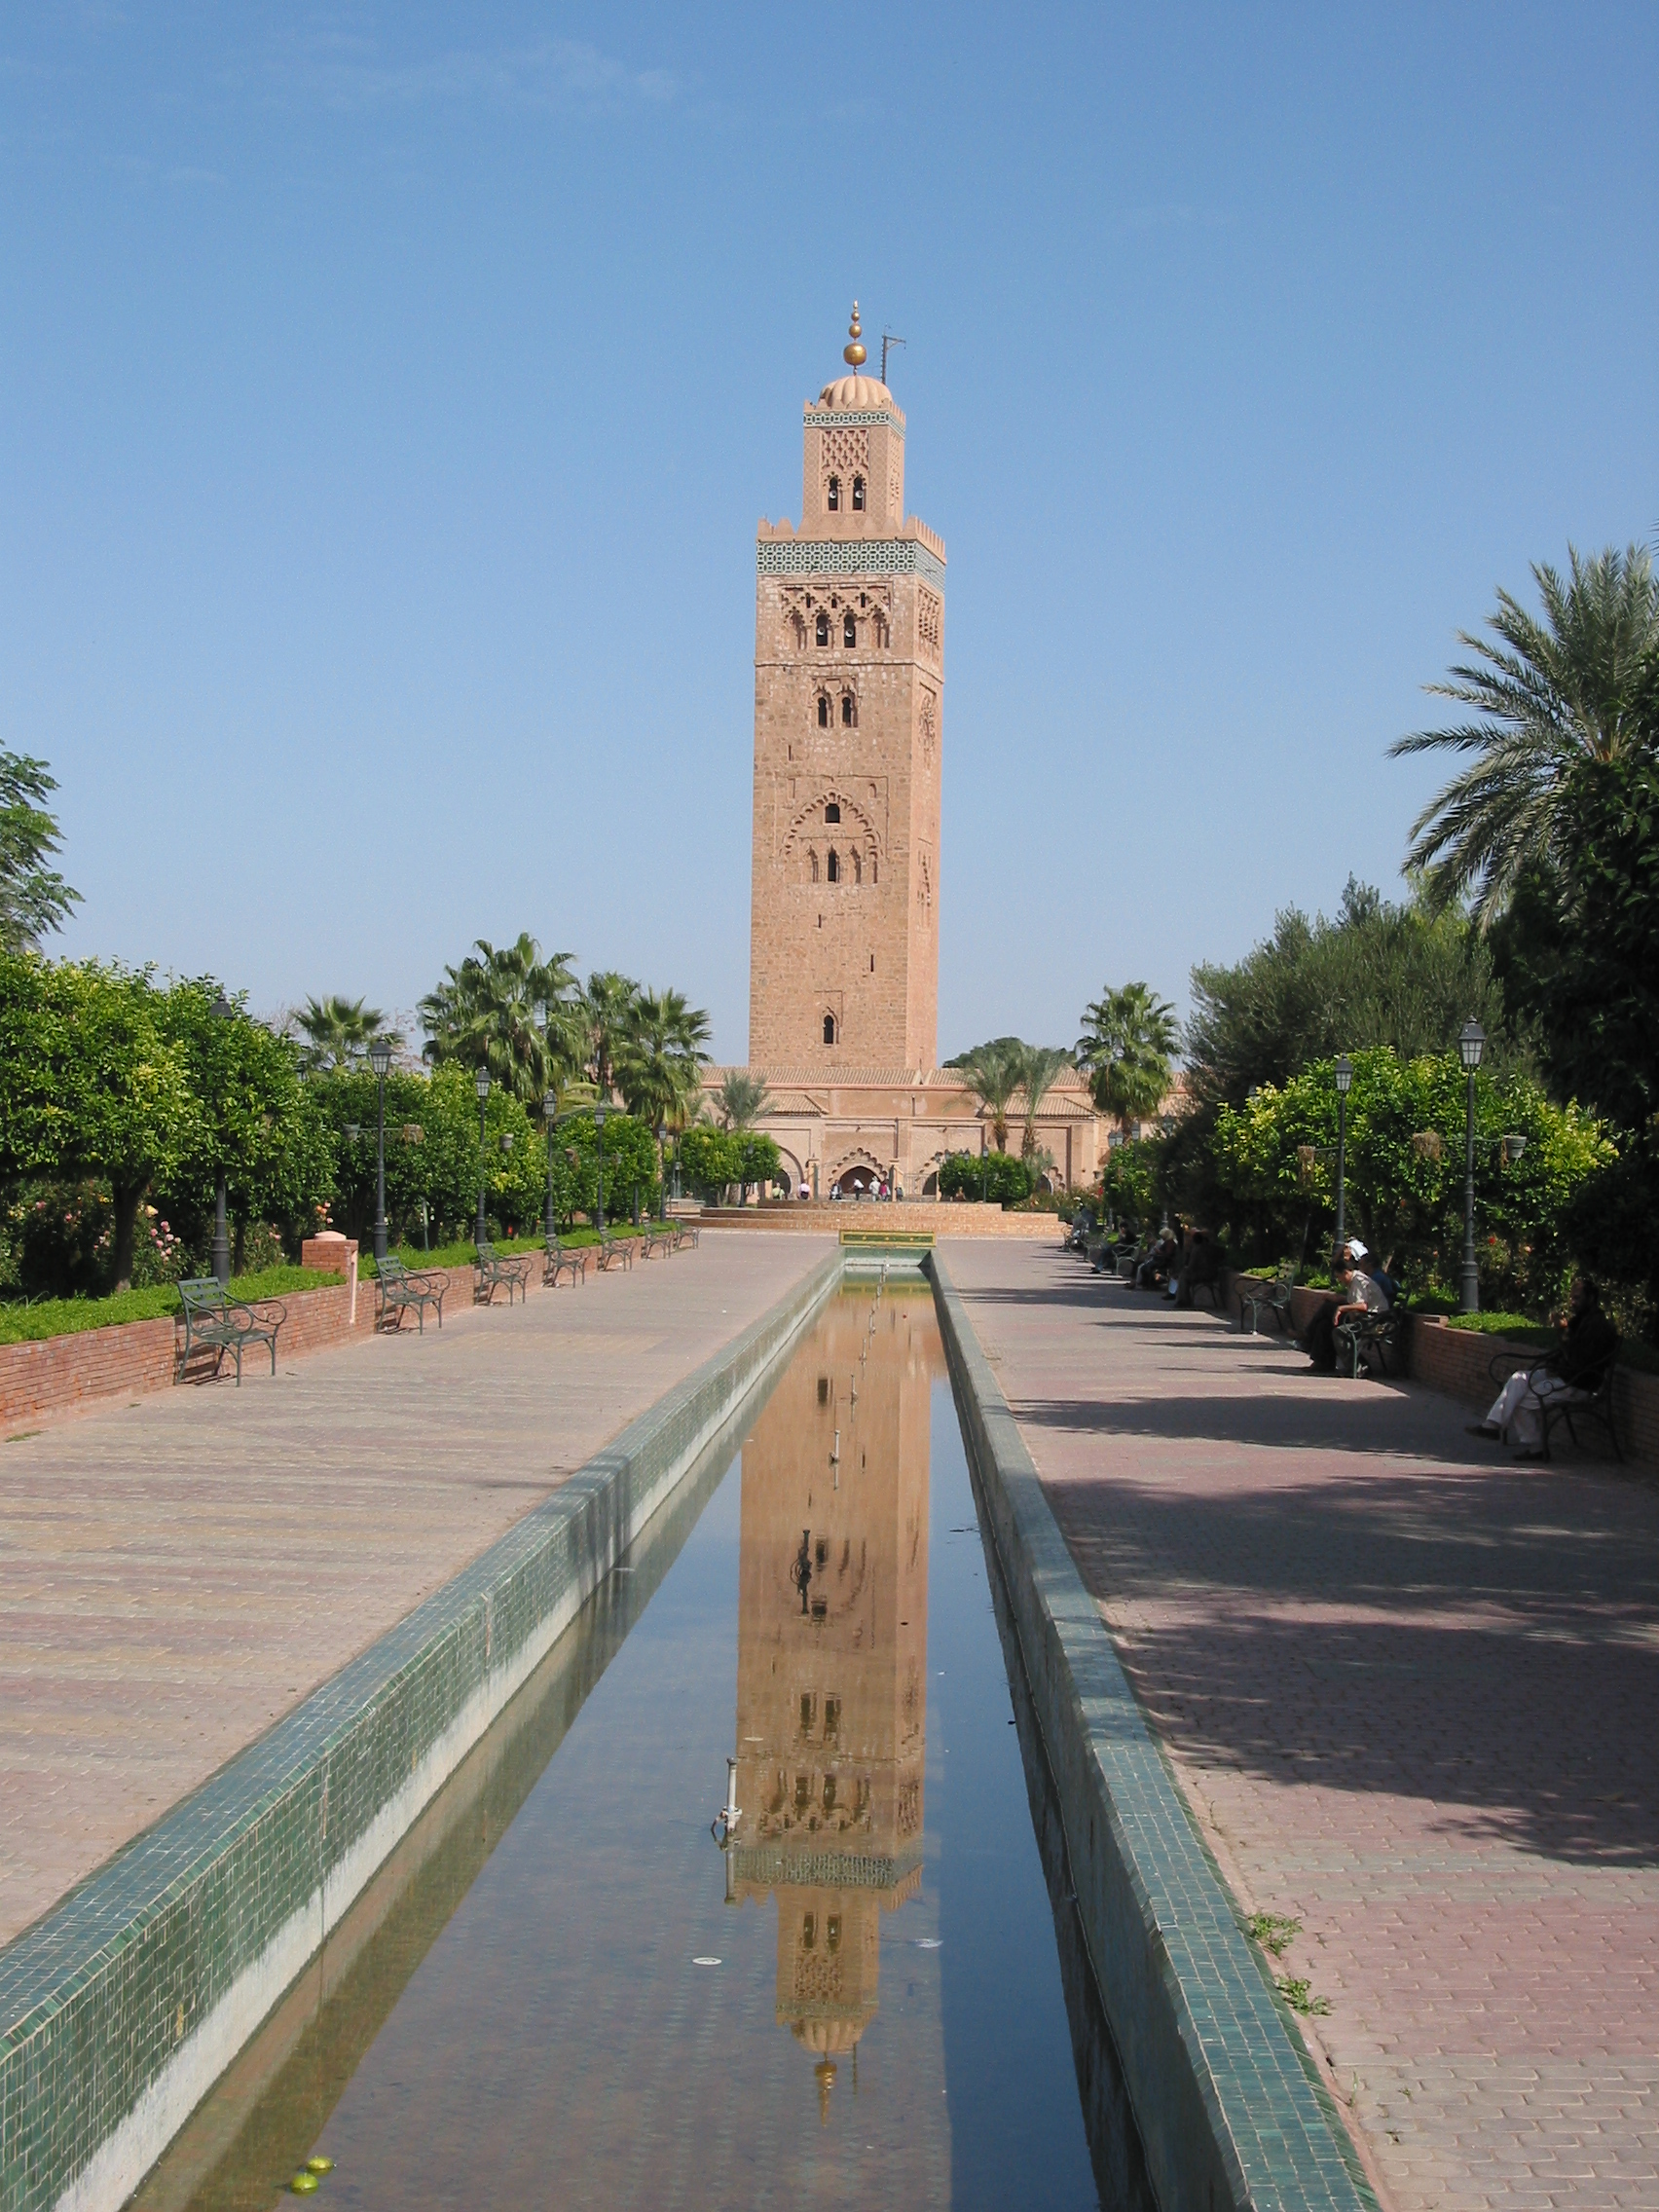 La koutoubia et son reflet dans l 39 eau marrakech maroc for Jardin koutoubia